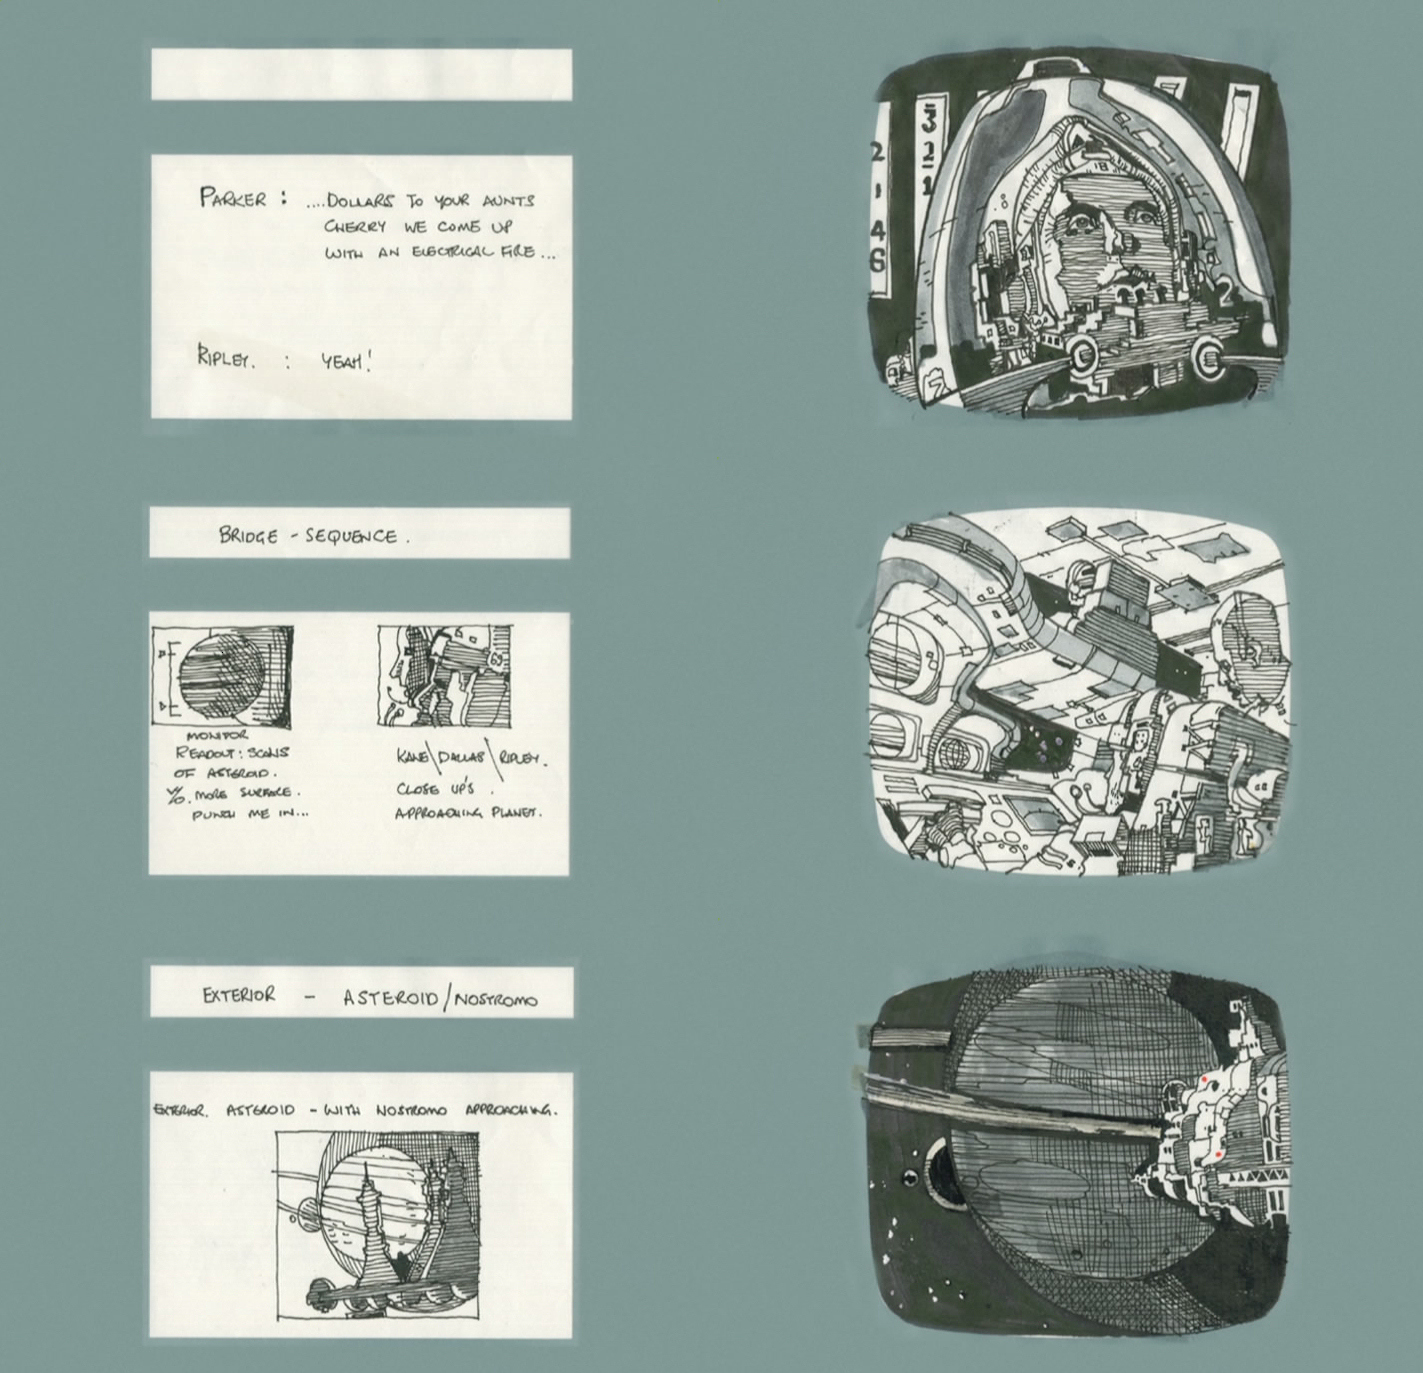 http://1.bp.blogspot.com/-bzCYr6xCsHg/T_21Z8RYOiI/AAAAAAAAASk/OkvZO6Uk1hI/s1600/ridley-scott-alien-storyboard.jpg